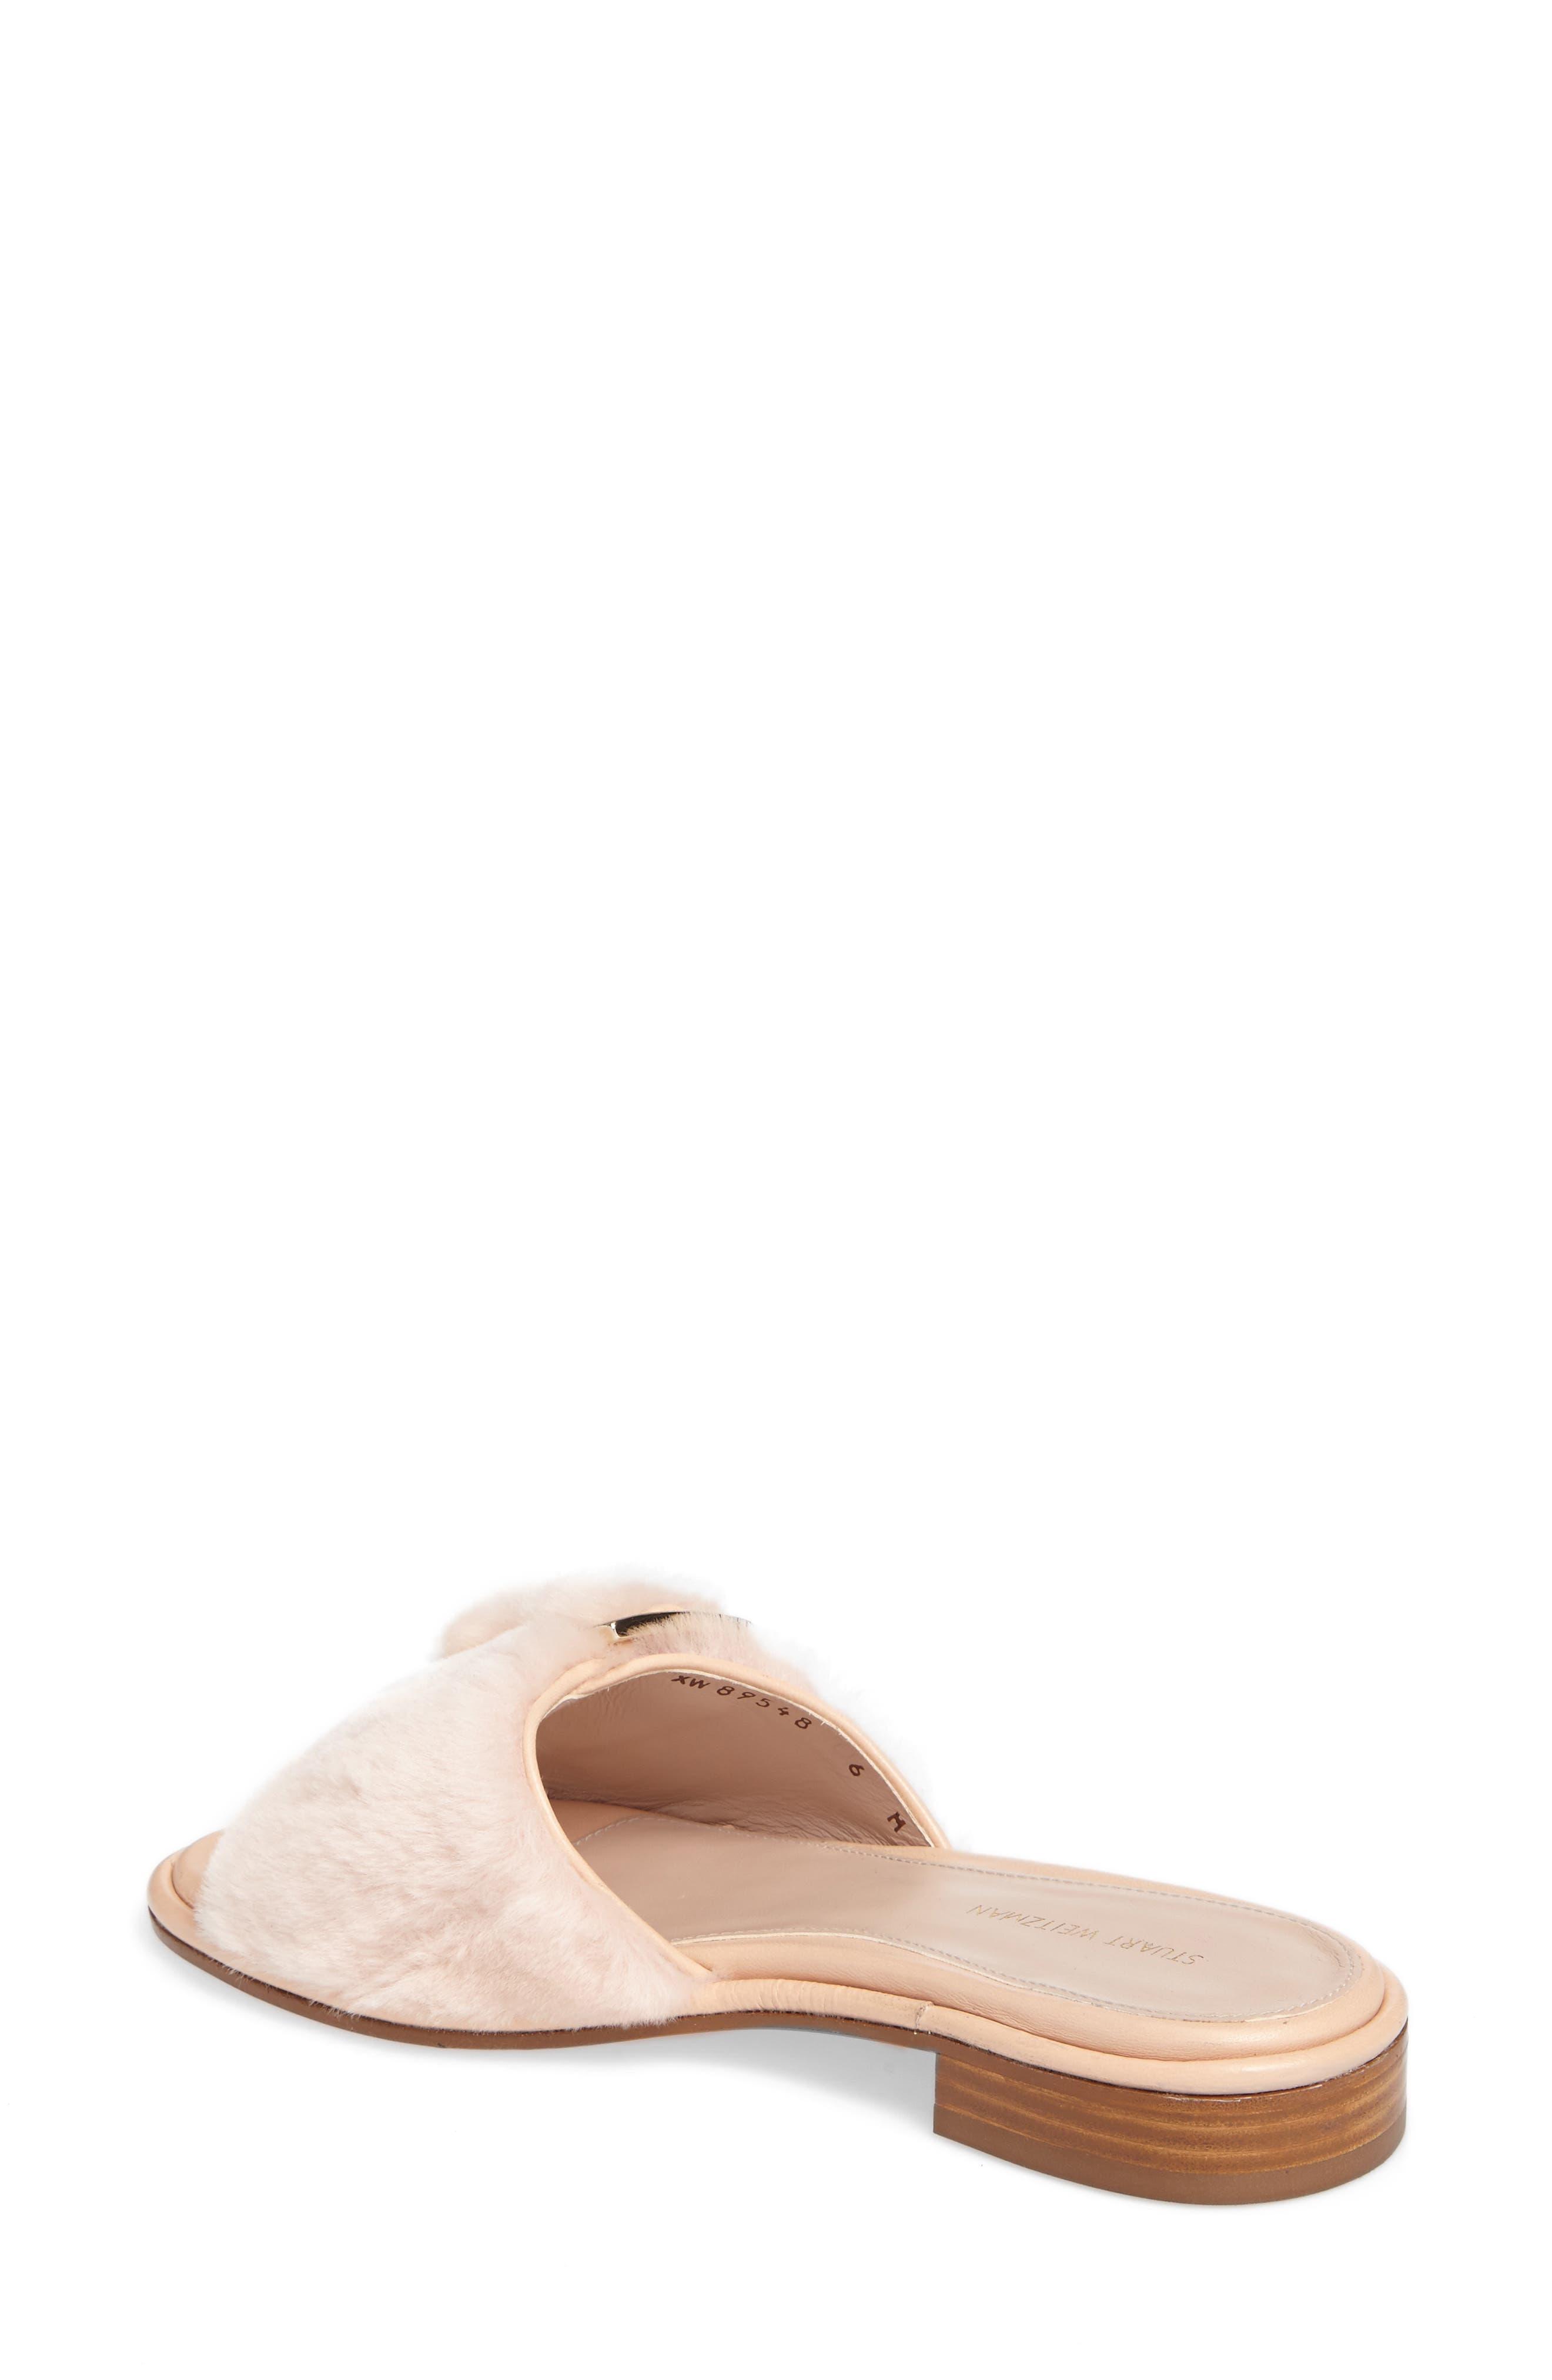 Fuzzywuz Genuine Shearling Slide Sandal,                             Alternate thumbnail 2, color,                             270